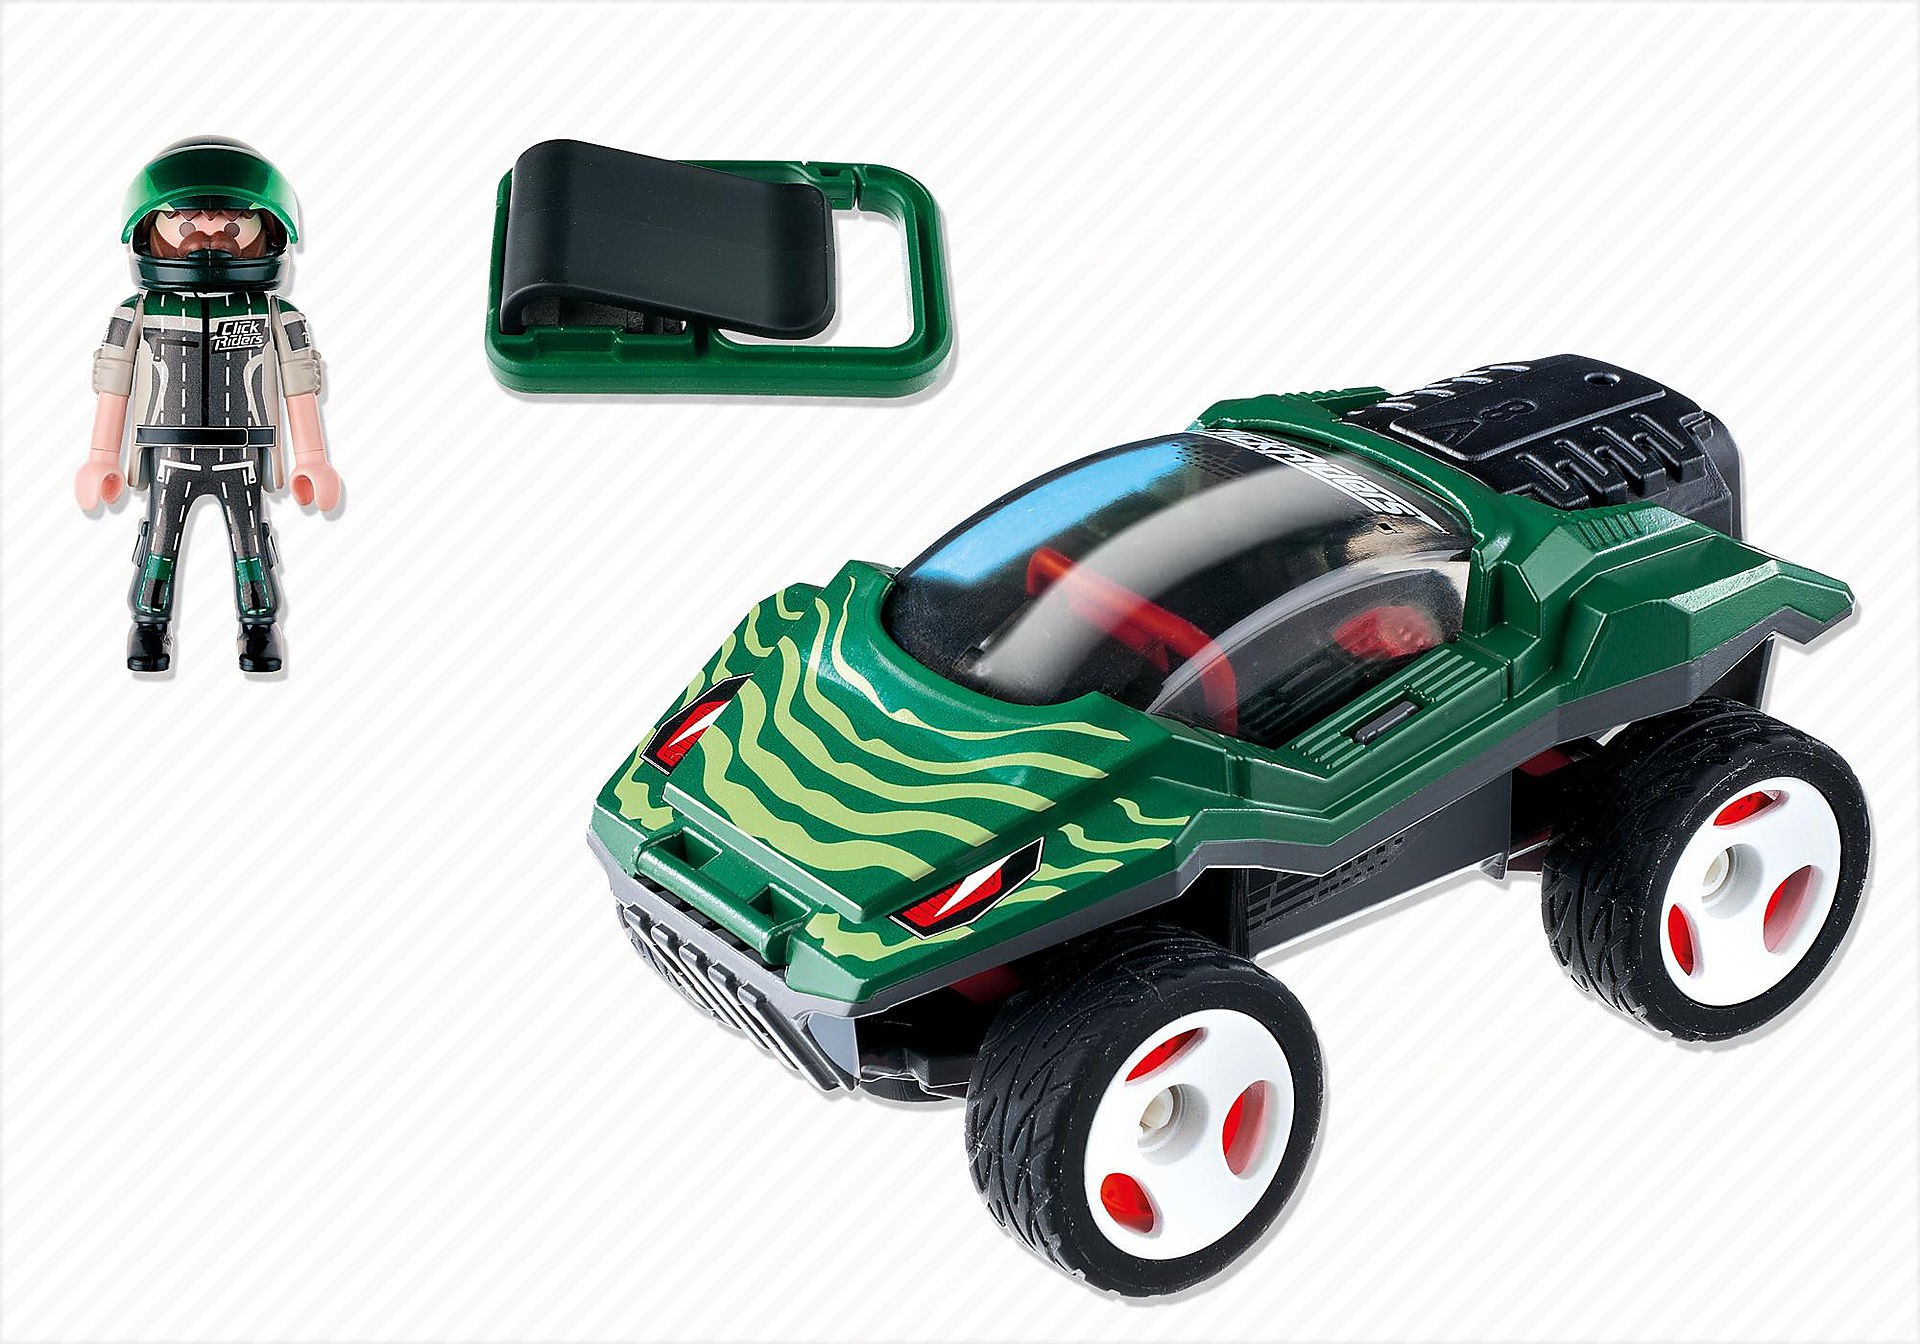 5160 Click & Go Snake Racer zoom image4